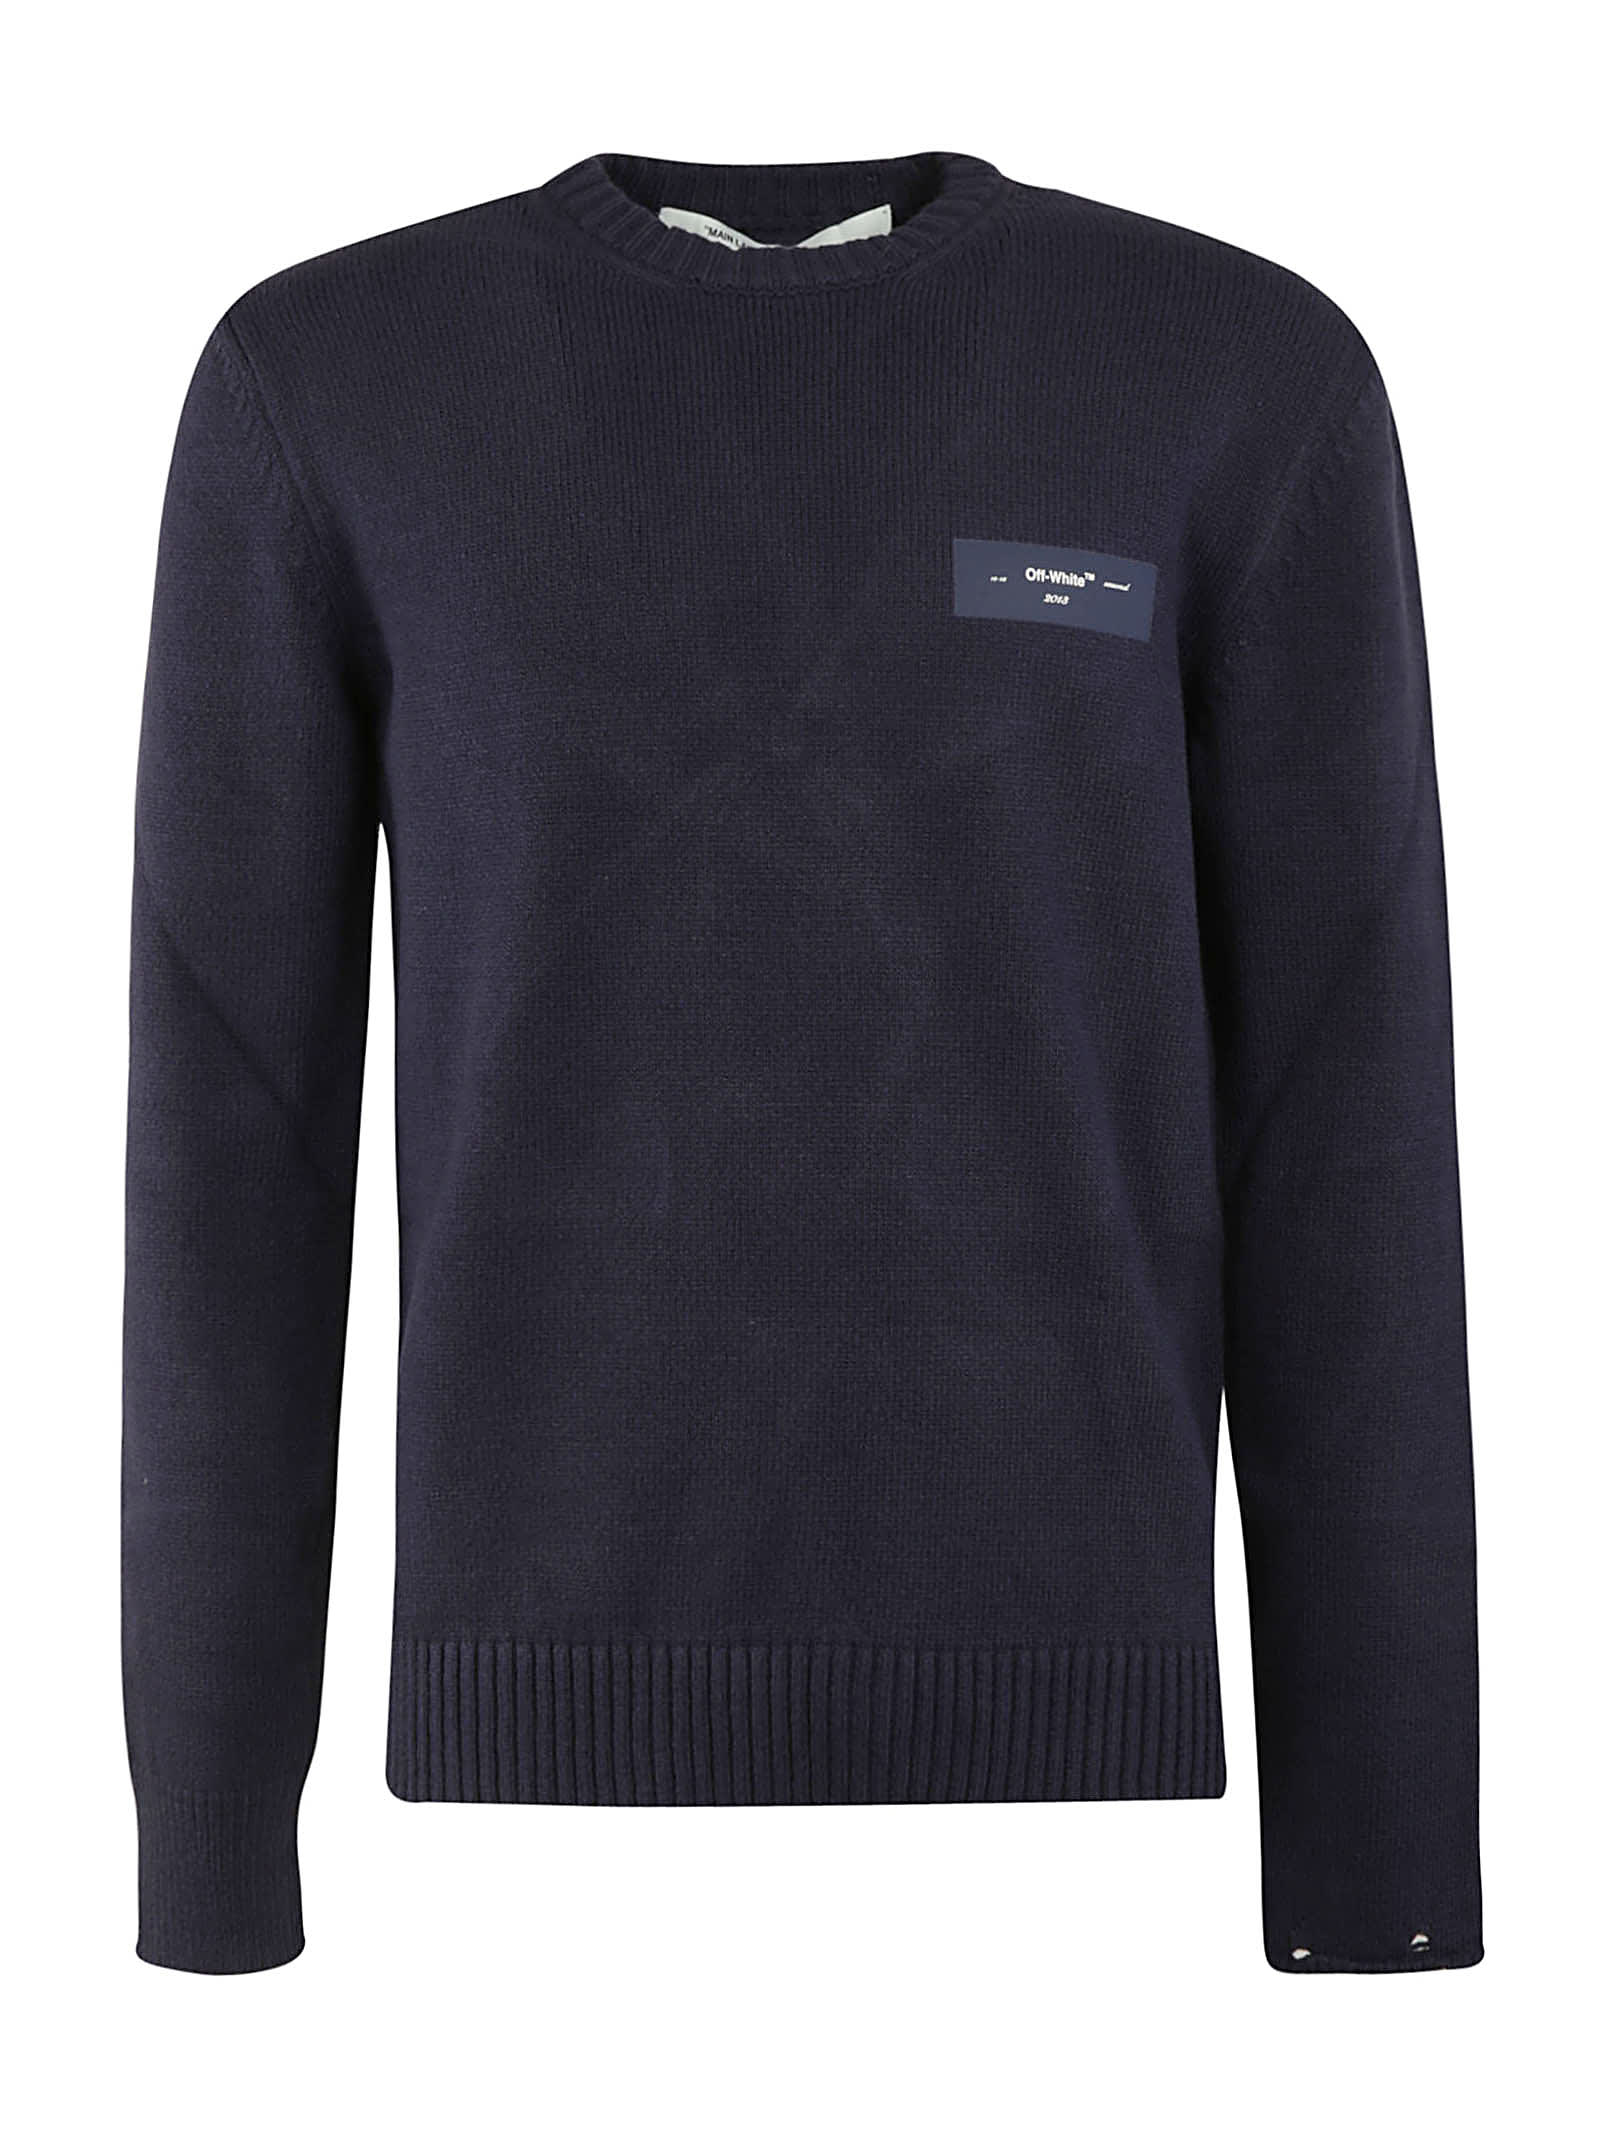 Off-White Logo Knit Crewneck Sweatshirt